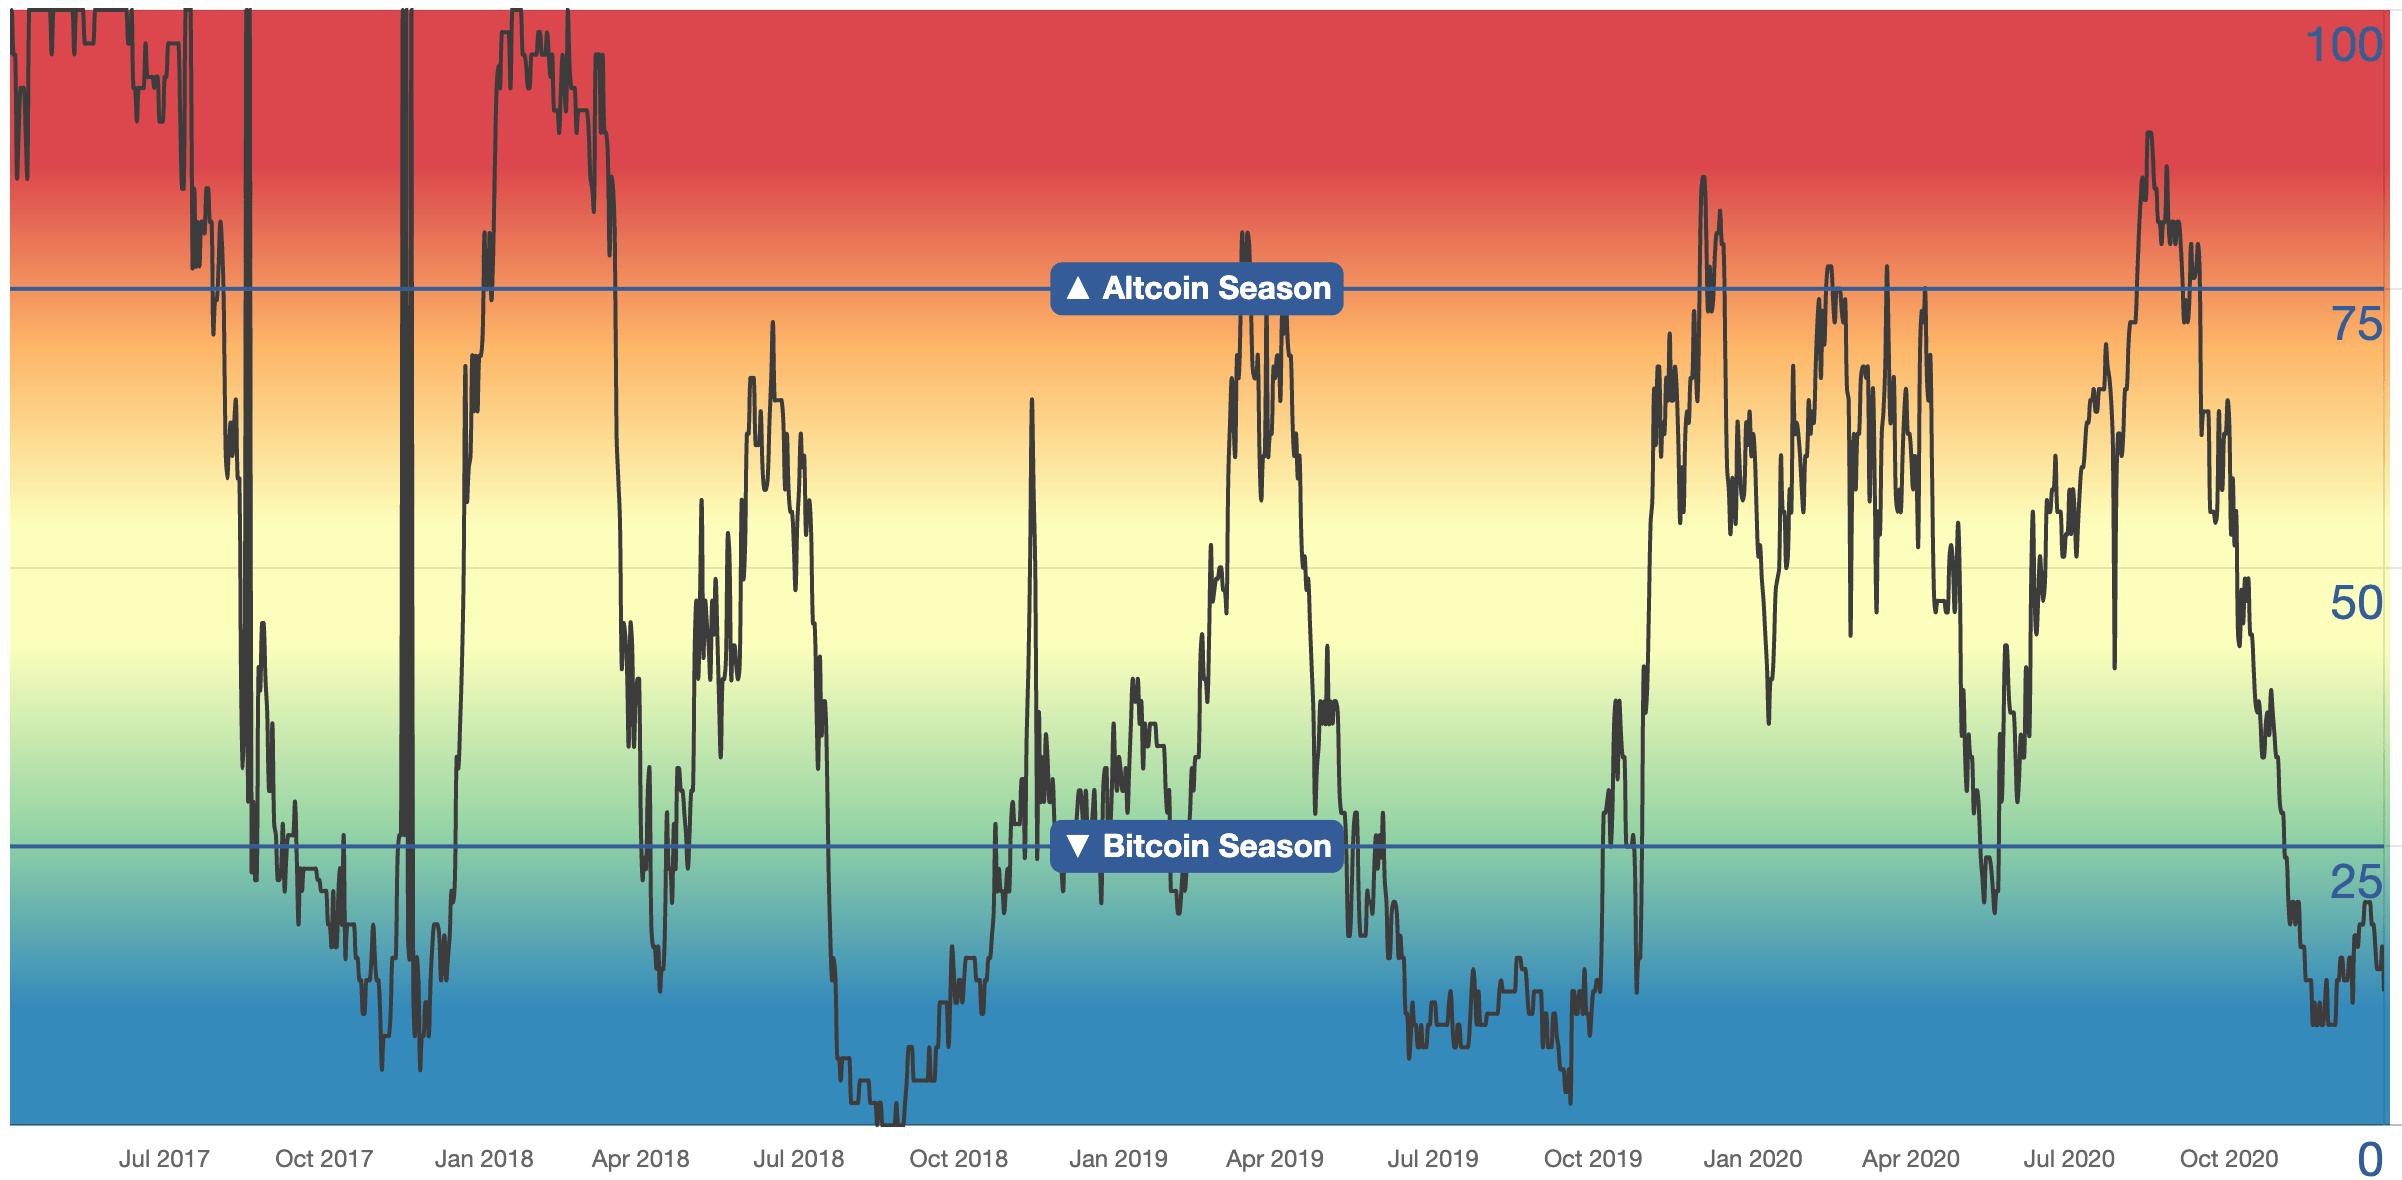 Altseason Index